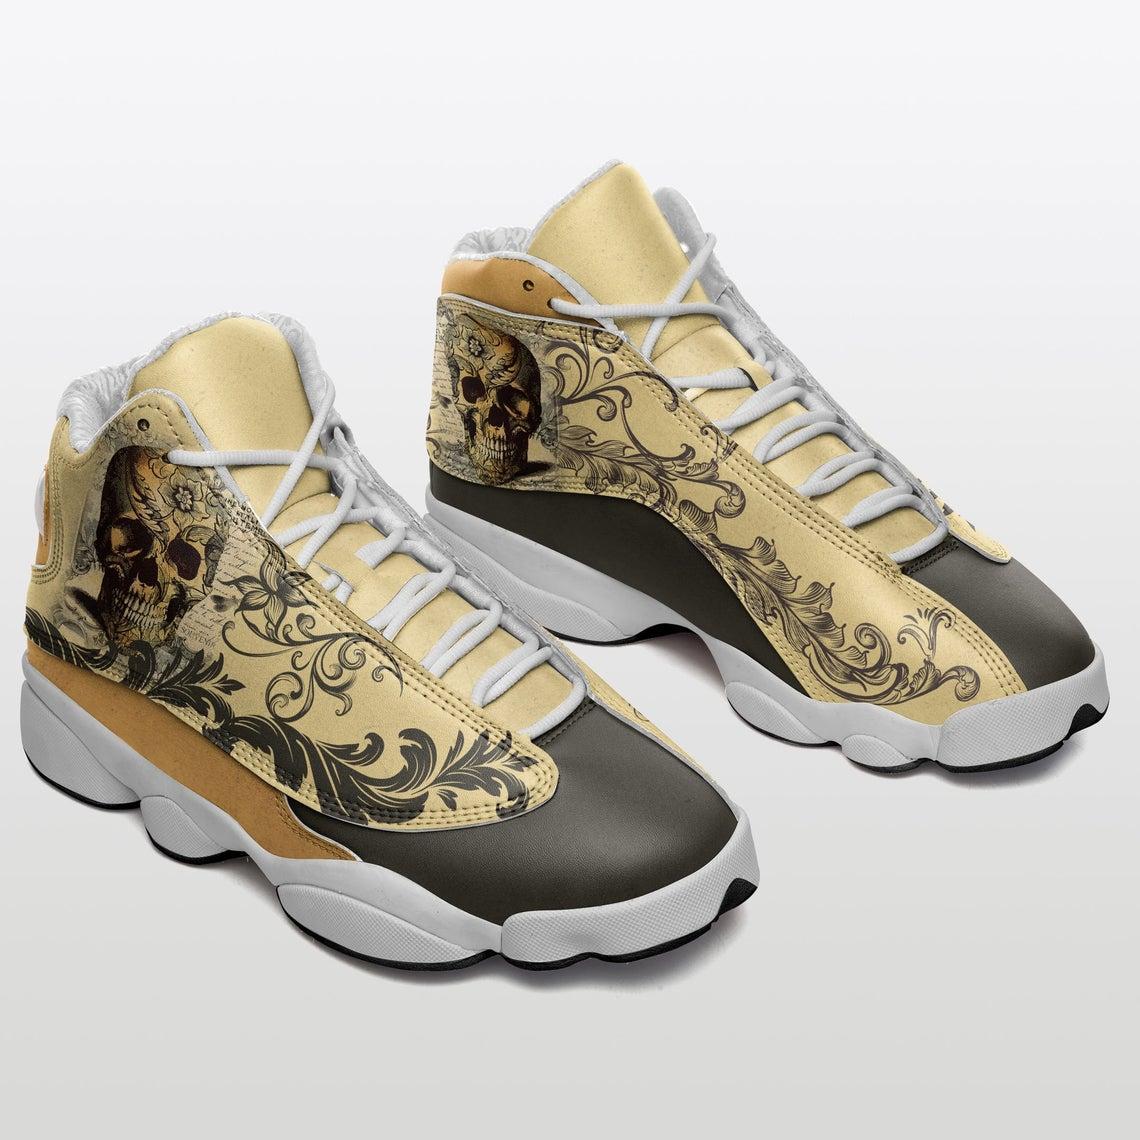 Skull Sku 31 Air Jordan Shoes